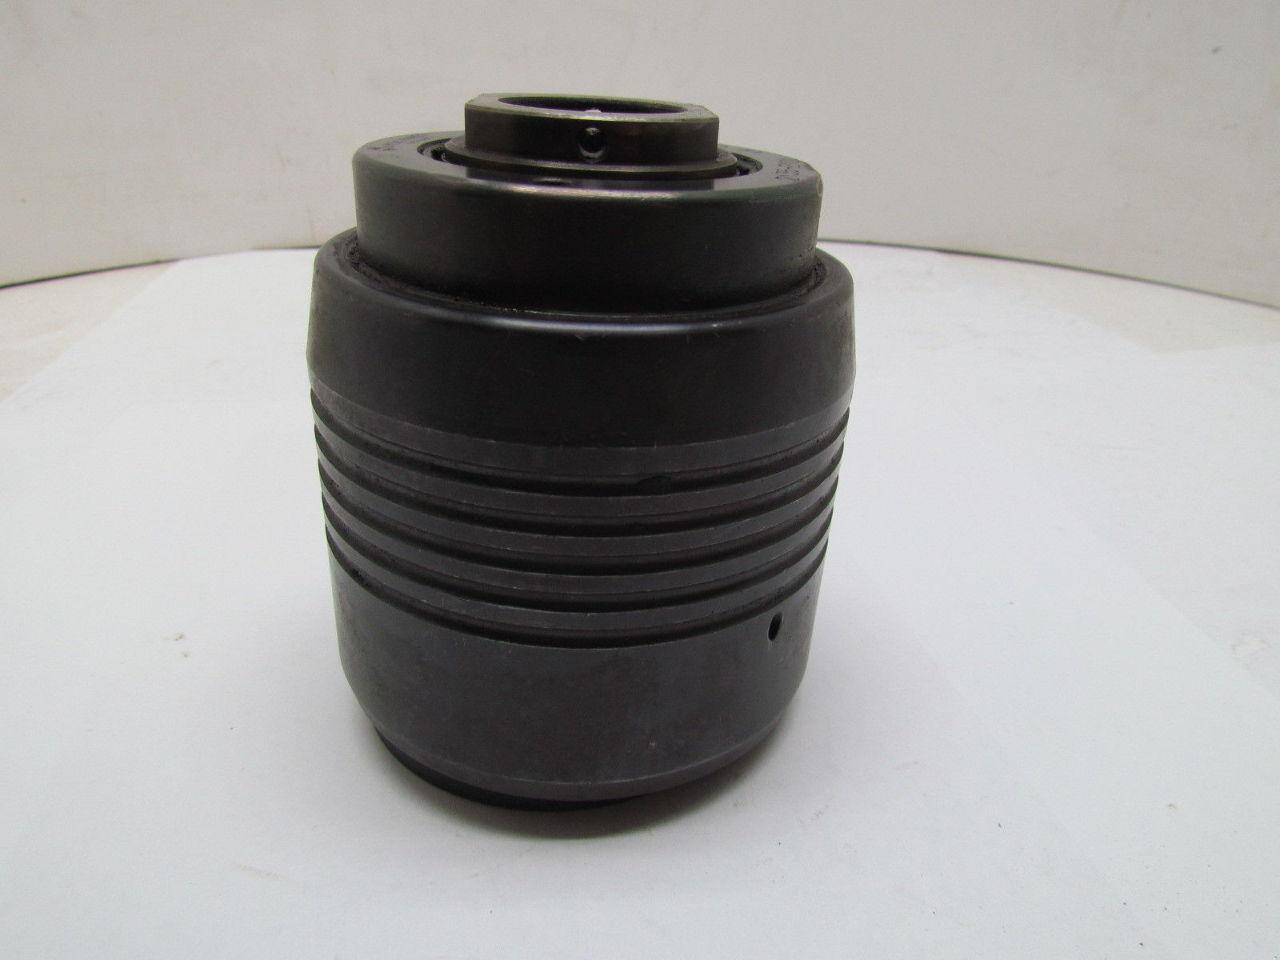 Hilma rumheld hydraulic hollow piston single acting t slot